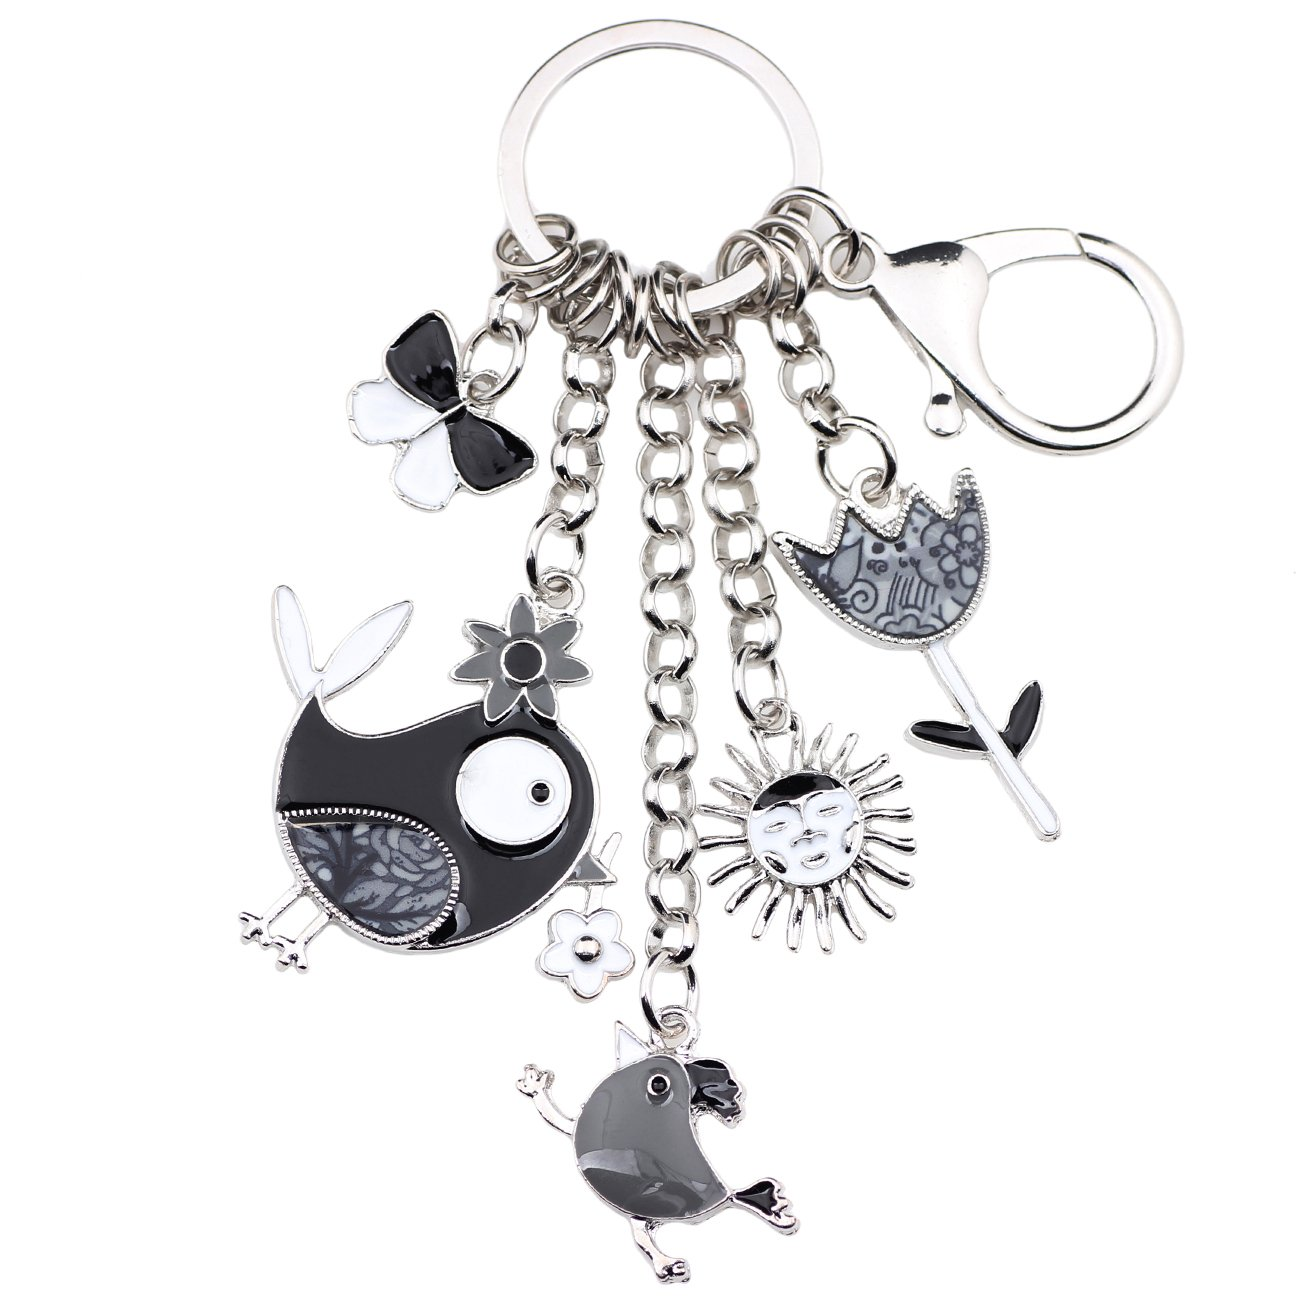 Bonsny Enamel Zinc Alloy Birds Flower Butterfly Key Chains Keyrings For Women Handbag Car Key Charms (Grey)